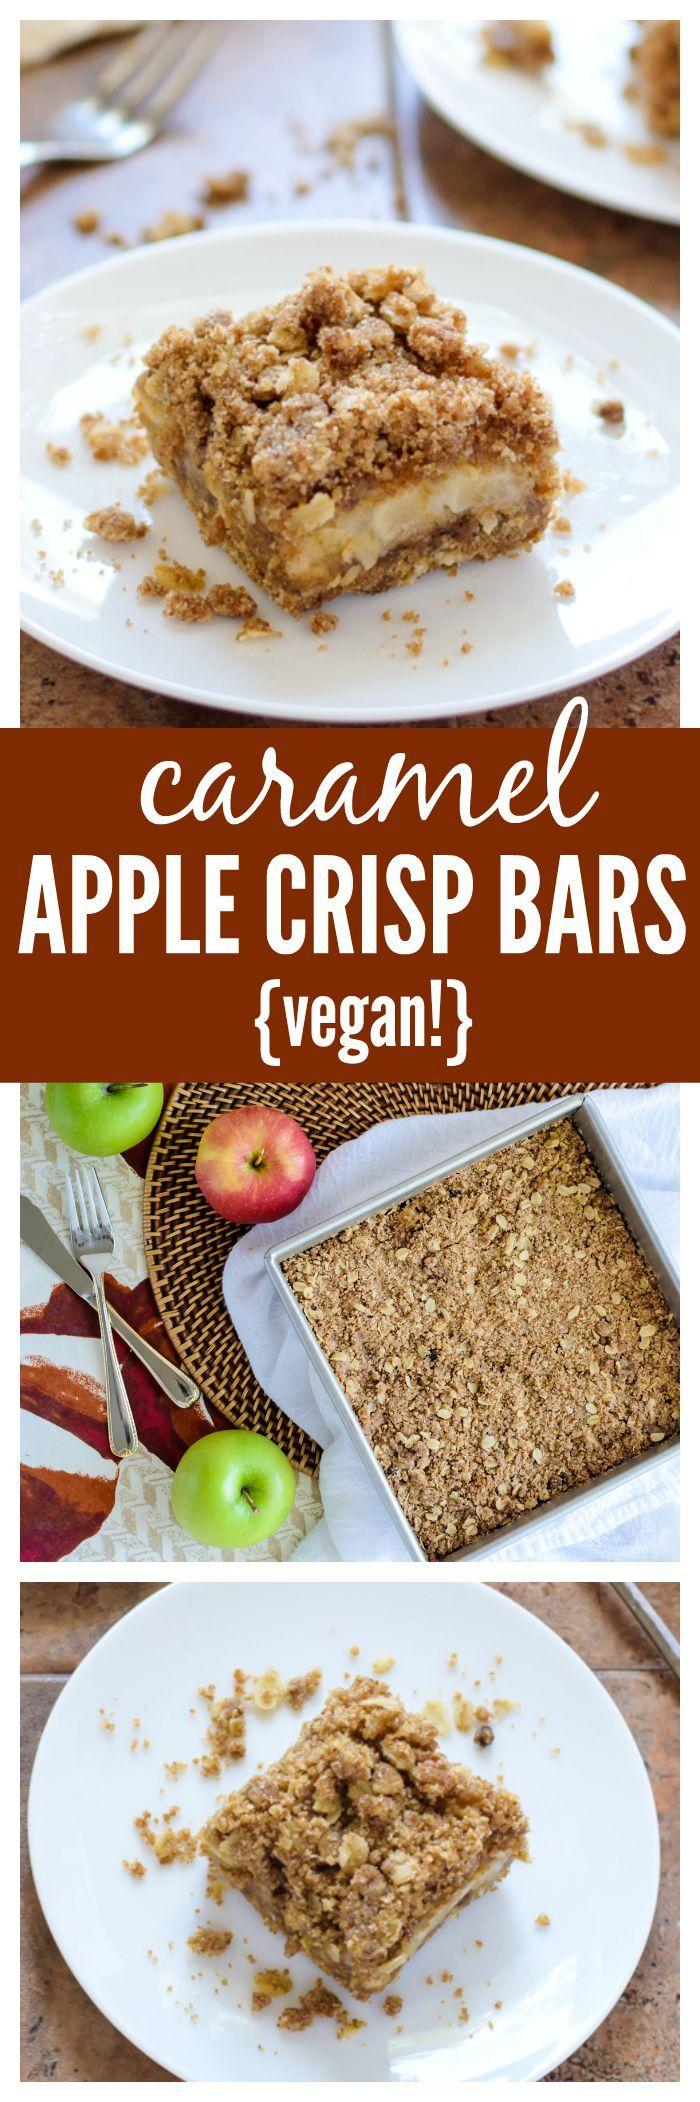 Caramel Apple Crisp Bars. Ooey gooey caramel apple bars with cinnamon streusel topping and crust. A healthy vegan recipe that tastes completely decadent! #apple #vegan